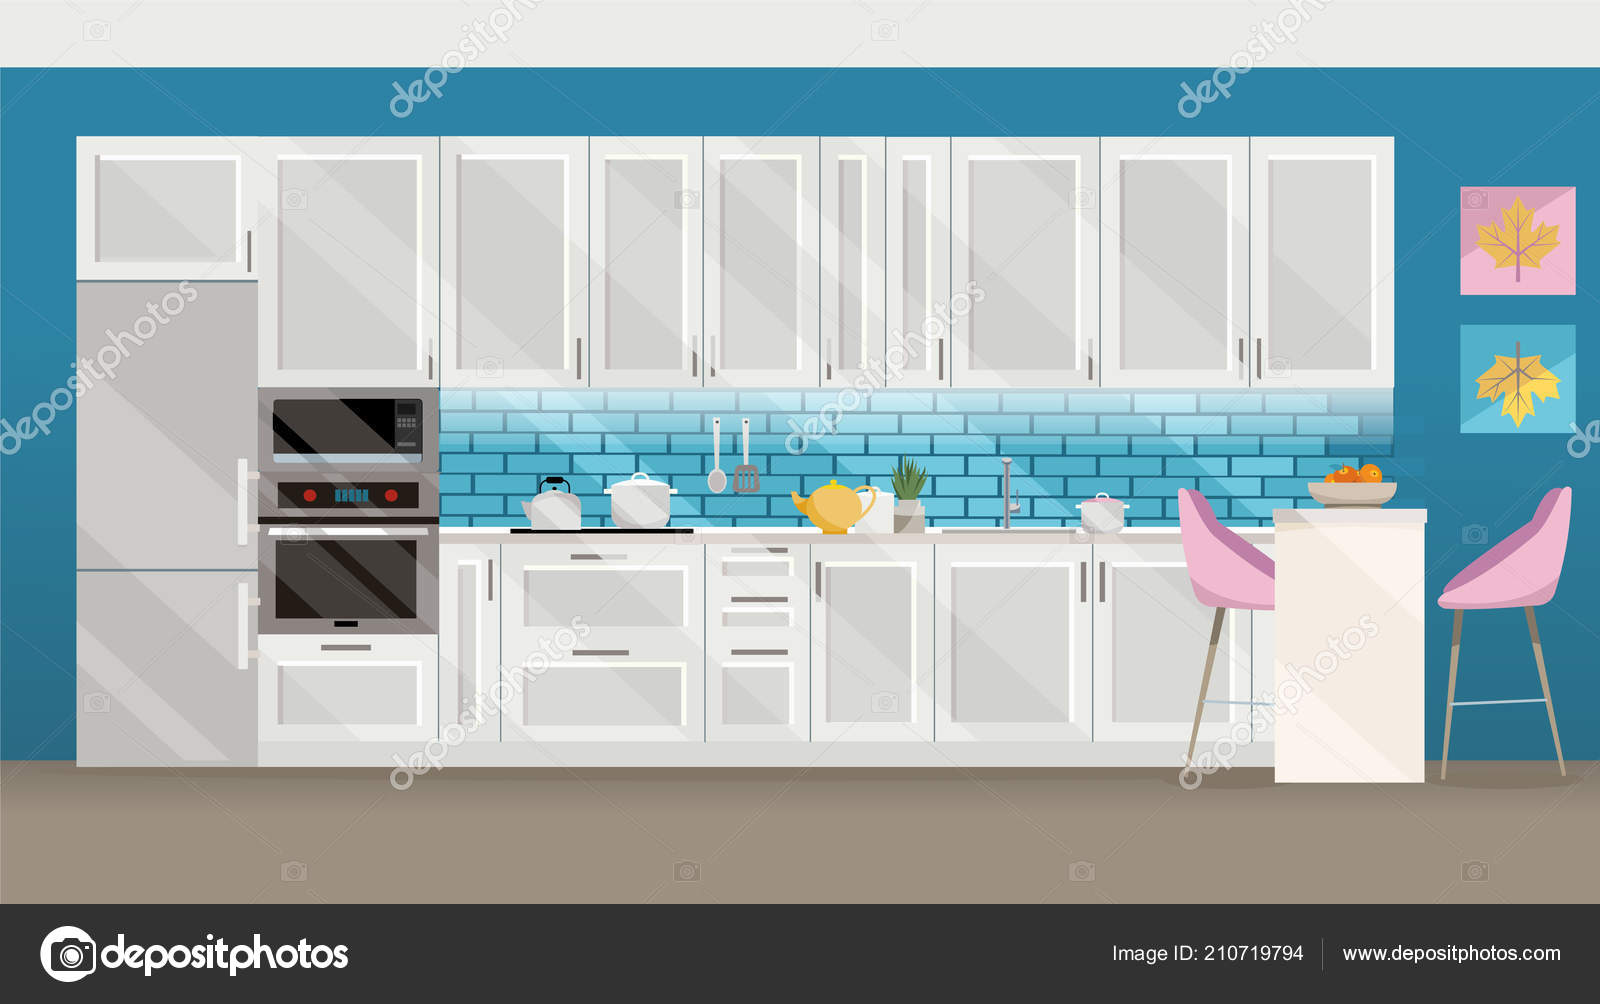 Flat modern interior kitchen room in turquoise tones. Kitchen ...